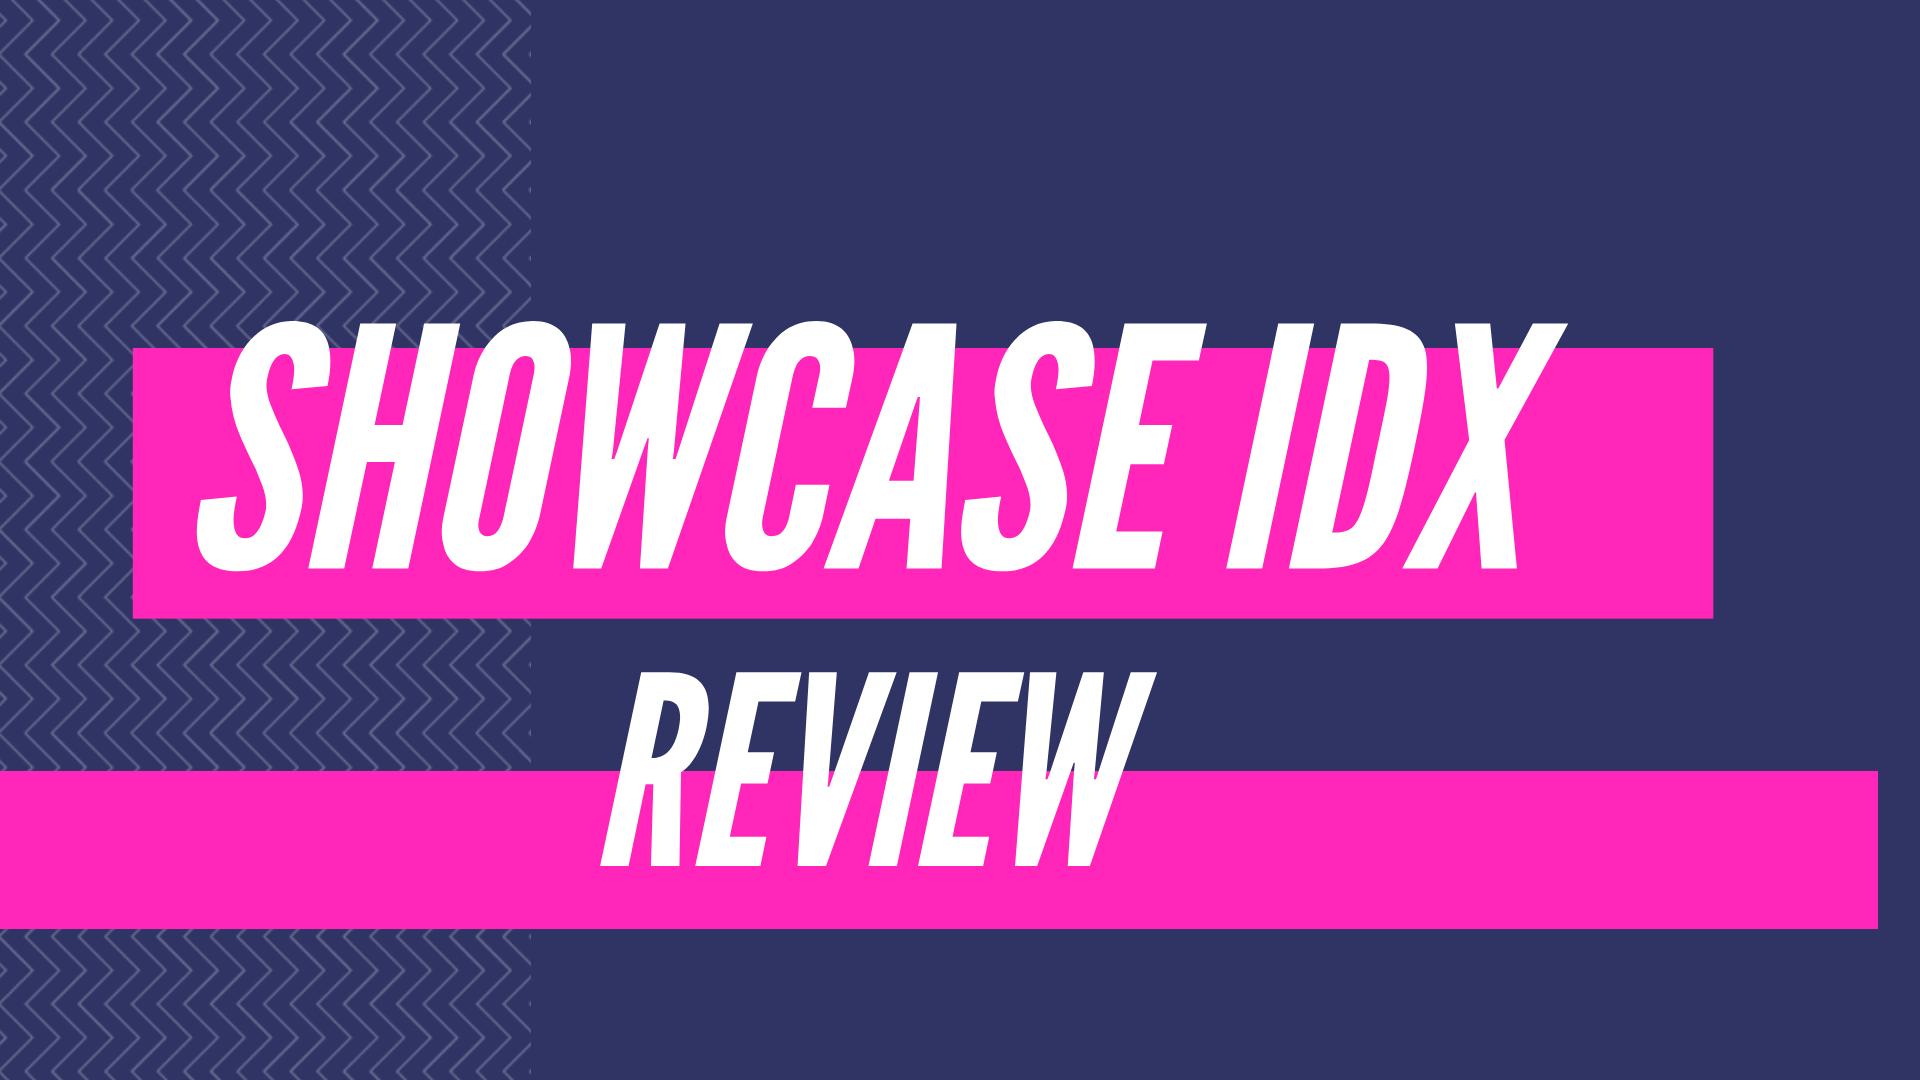 Showcase IDX review